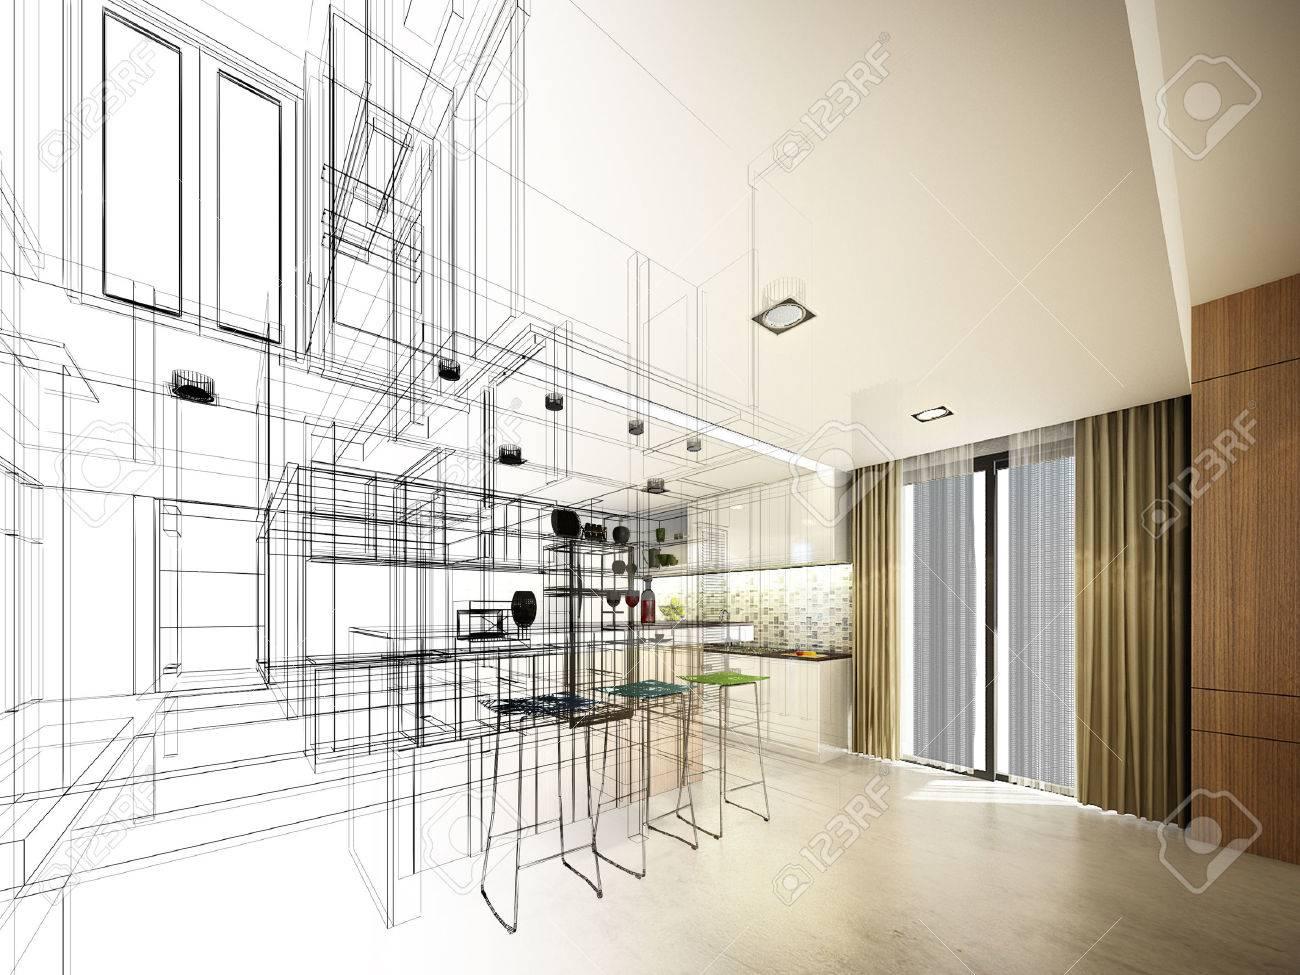 Abstract sketch design of interior kitchen - 33218542